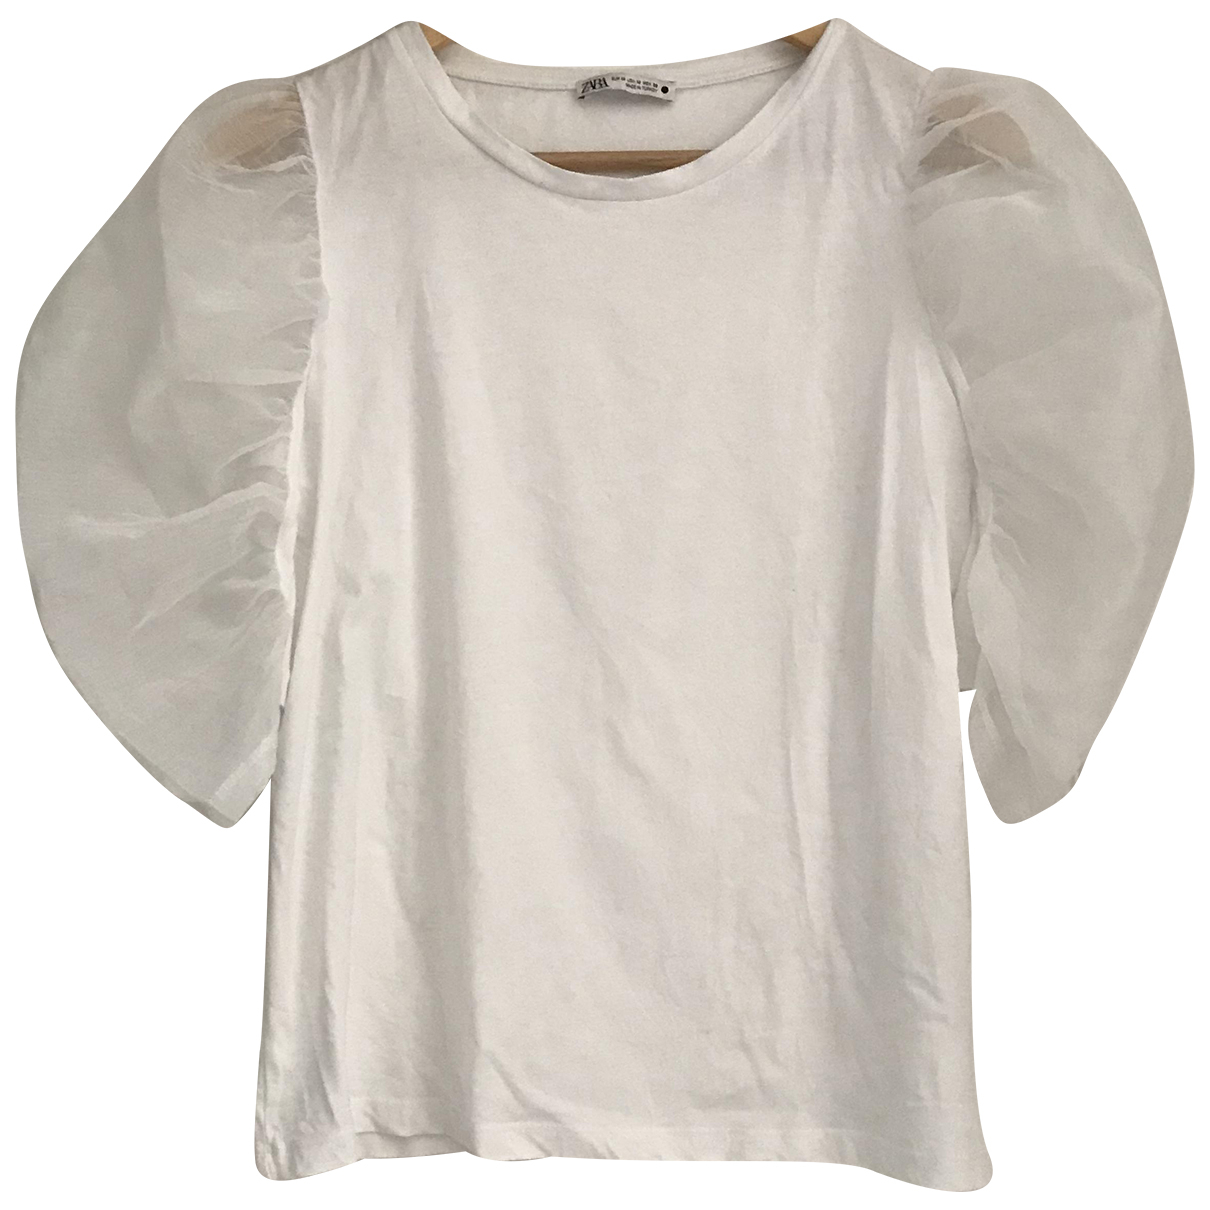 Zara \N White Cotton  top for Women 38 FR